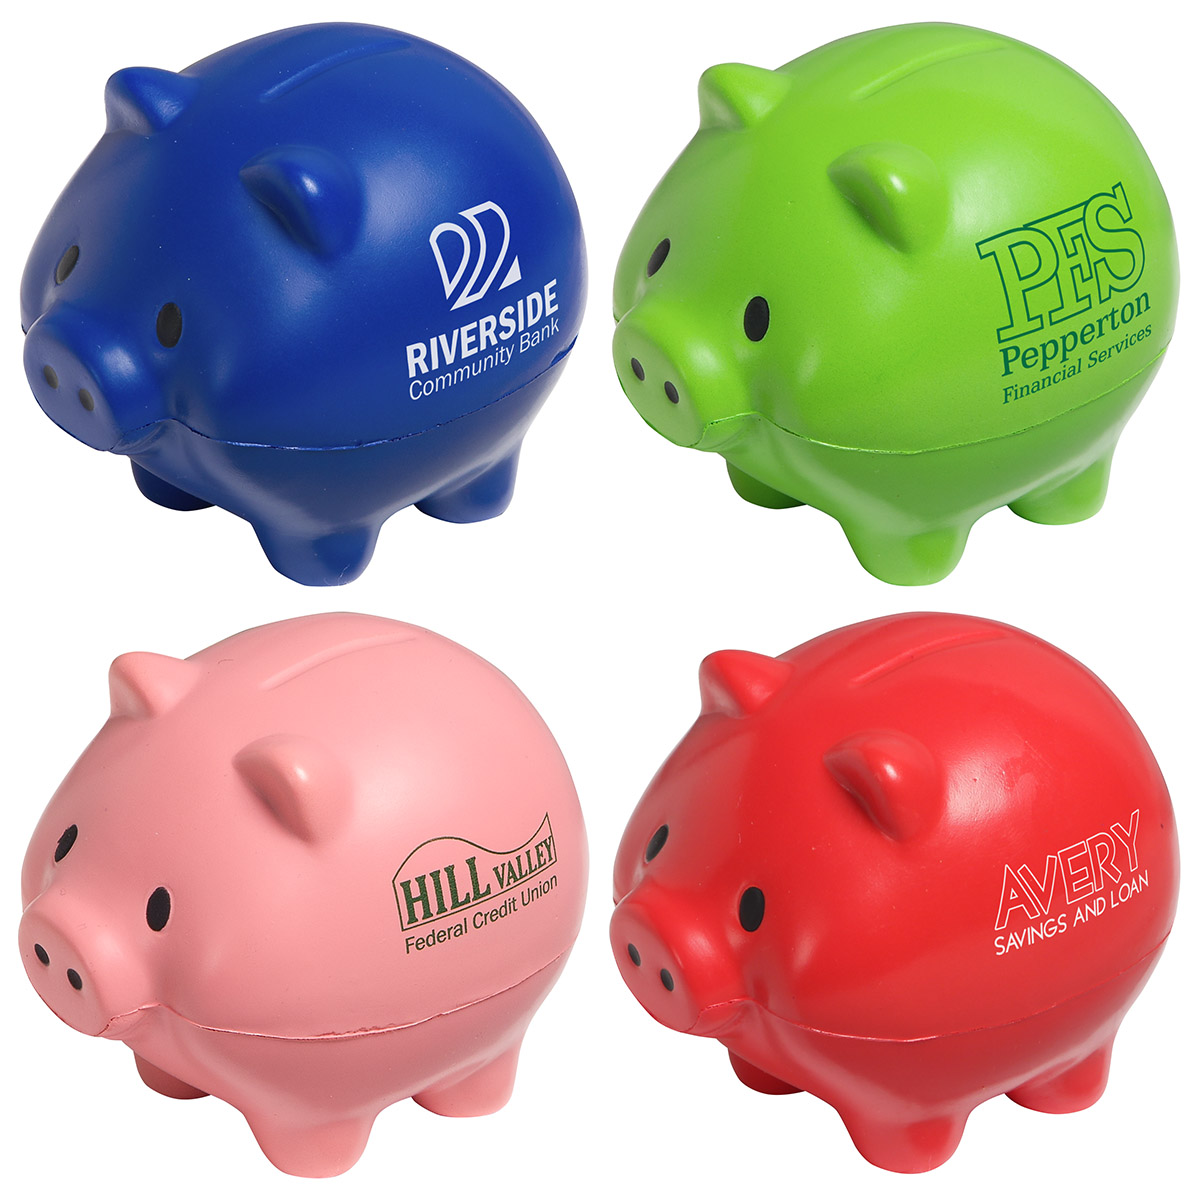 Thrifty Pig Stress Reliever, LFN-TP20, 1 Colour Imprint